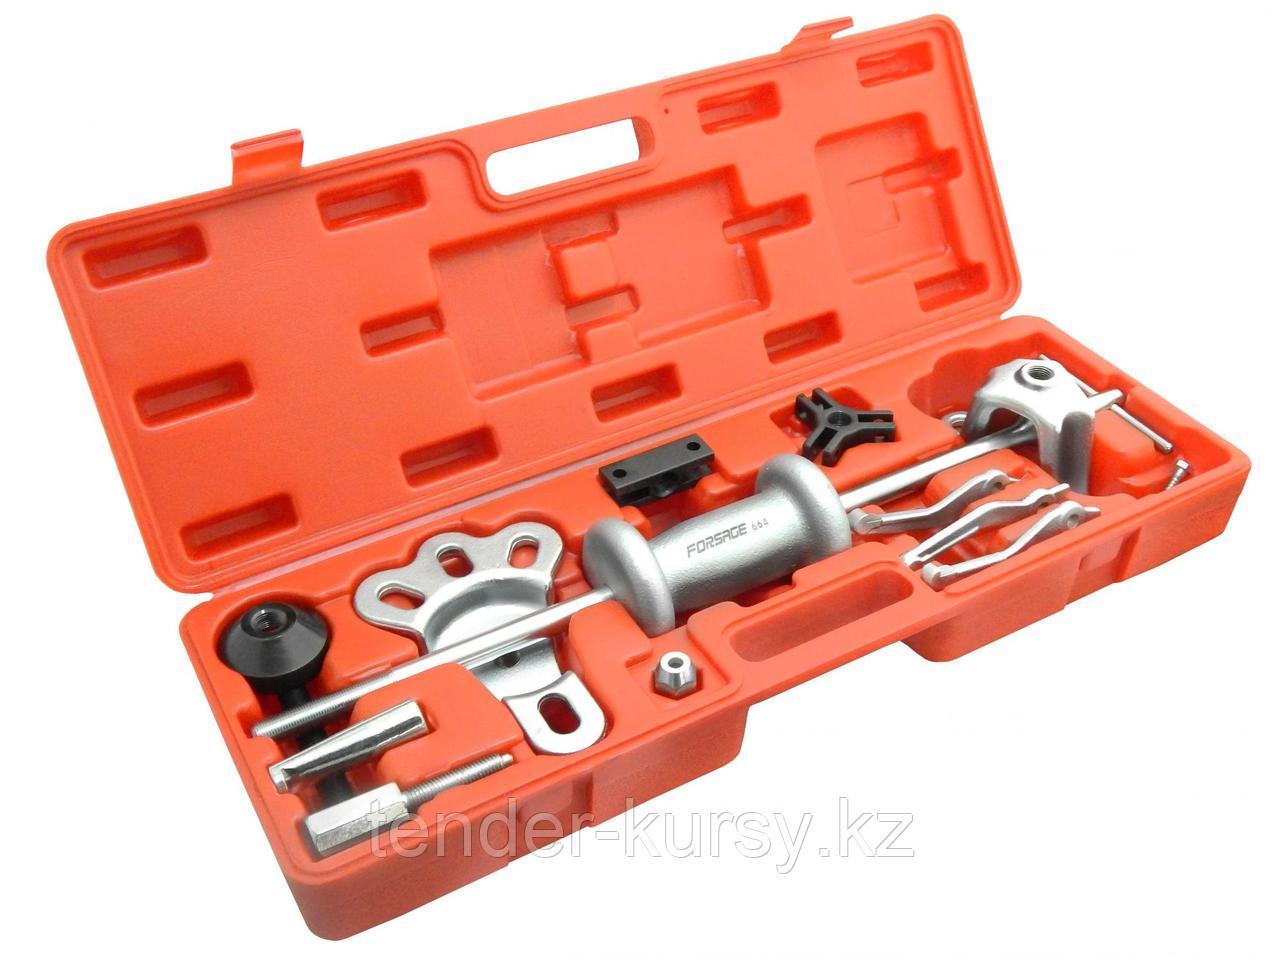 Forsage Молоток обратный для съема подшипников в наборе со сменными лапами (17 предметов) в кейсе. Forsage